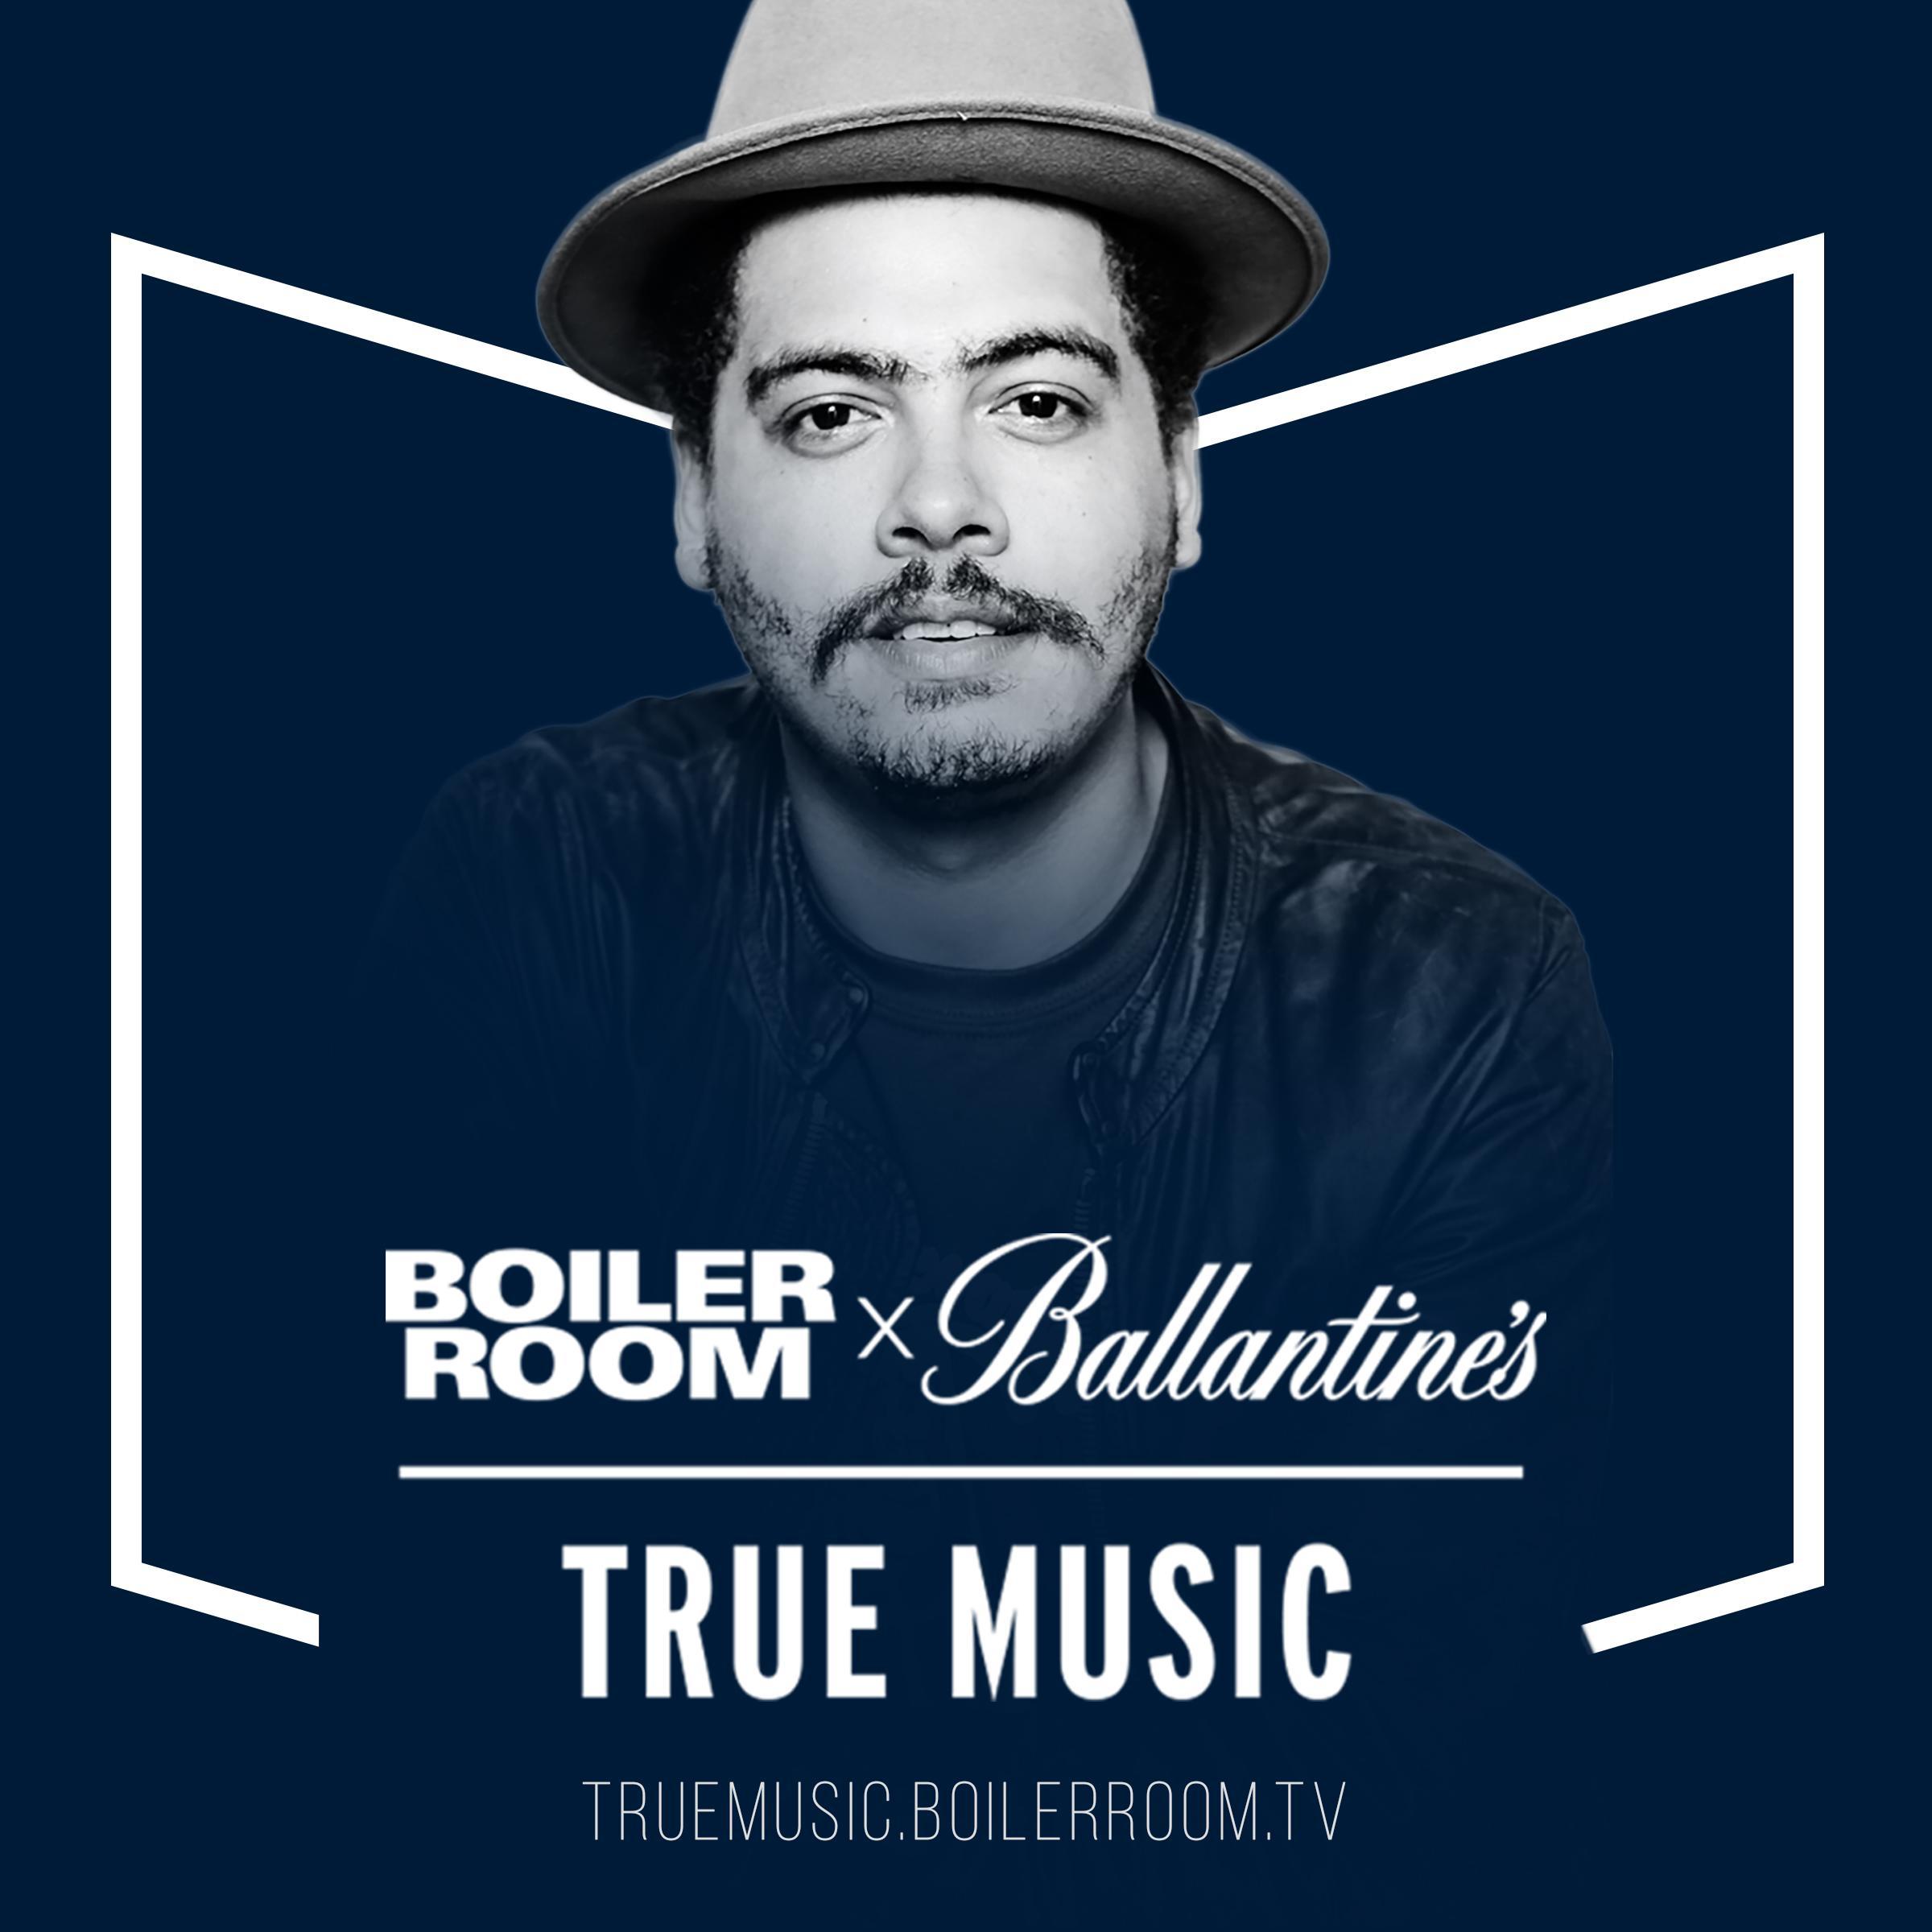 Ballantine\'s X Boiler Room announces new headline True Music artist ...